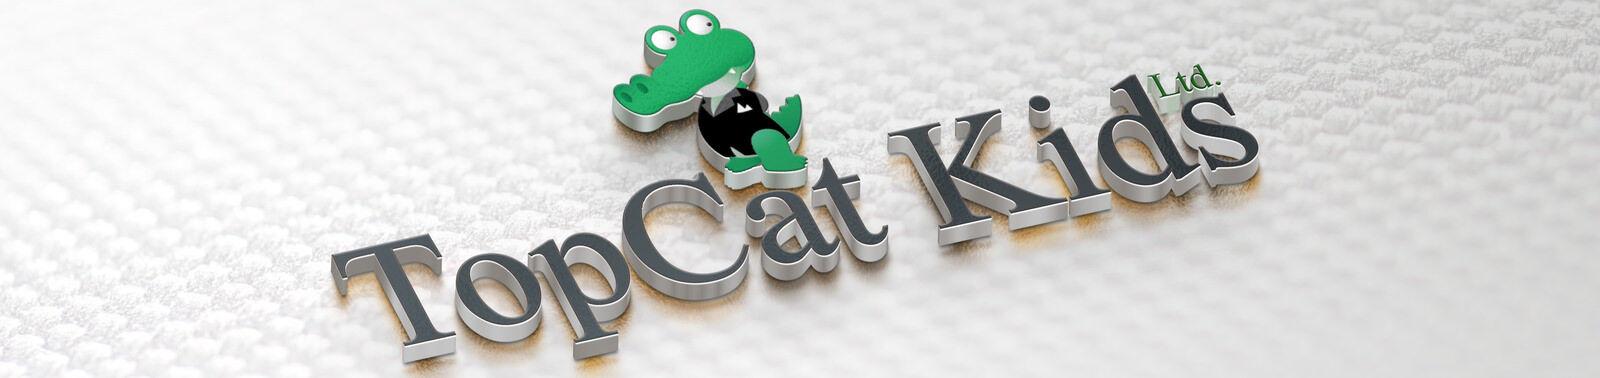 TopCat Kids